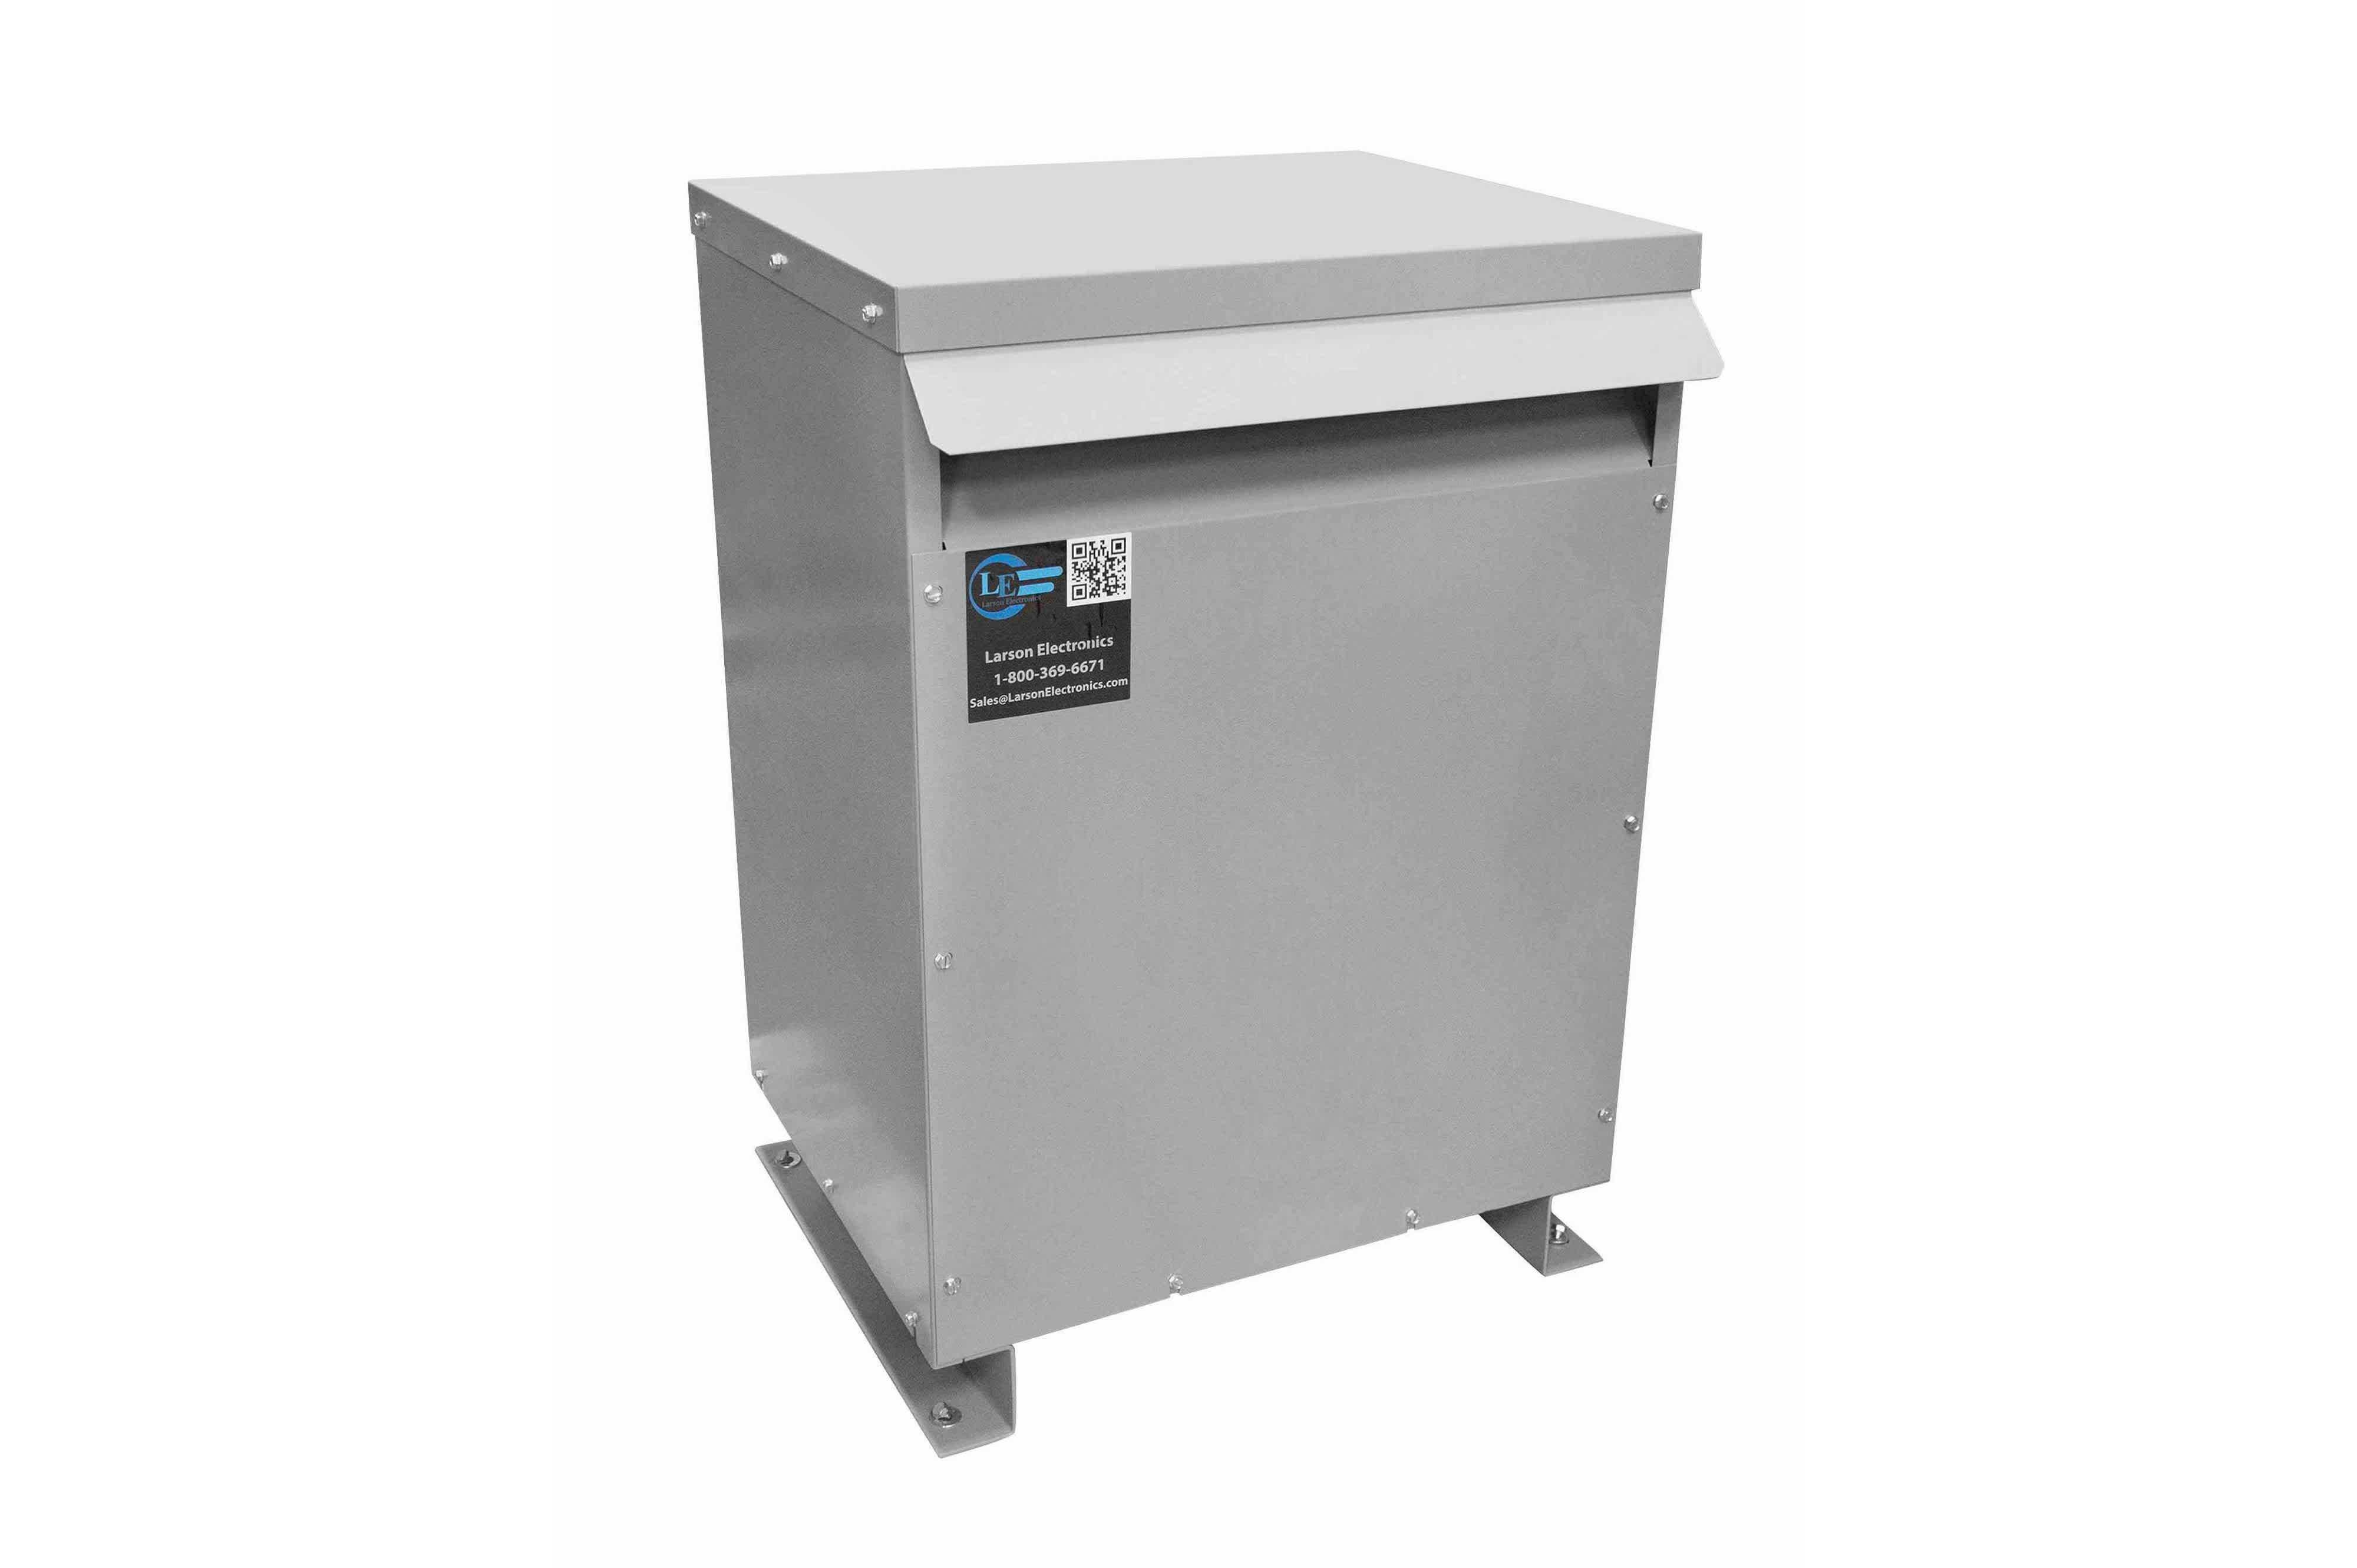 90 kVA 3PH Isolation Transformer, 400V Wye Primary, 208V Delta Secondary, N3R, Ventilated, 60 Hz